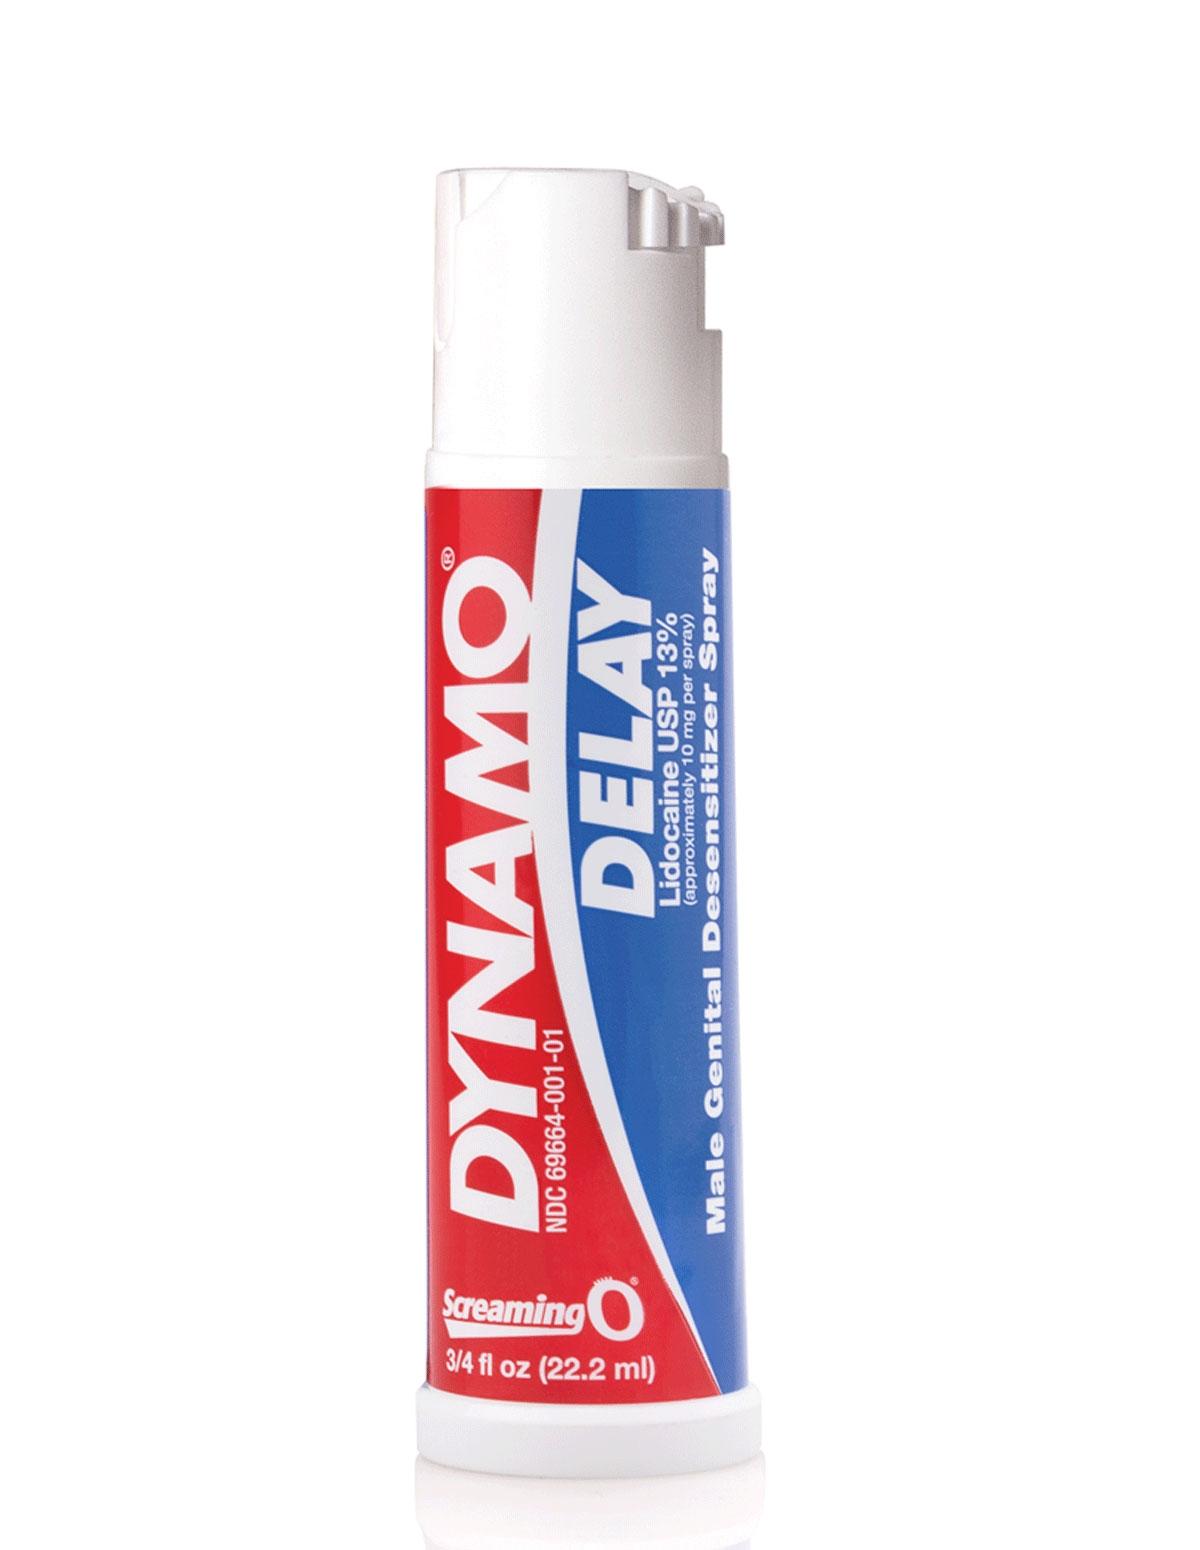 Screaming O Dynamo Delay For Men